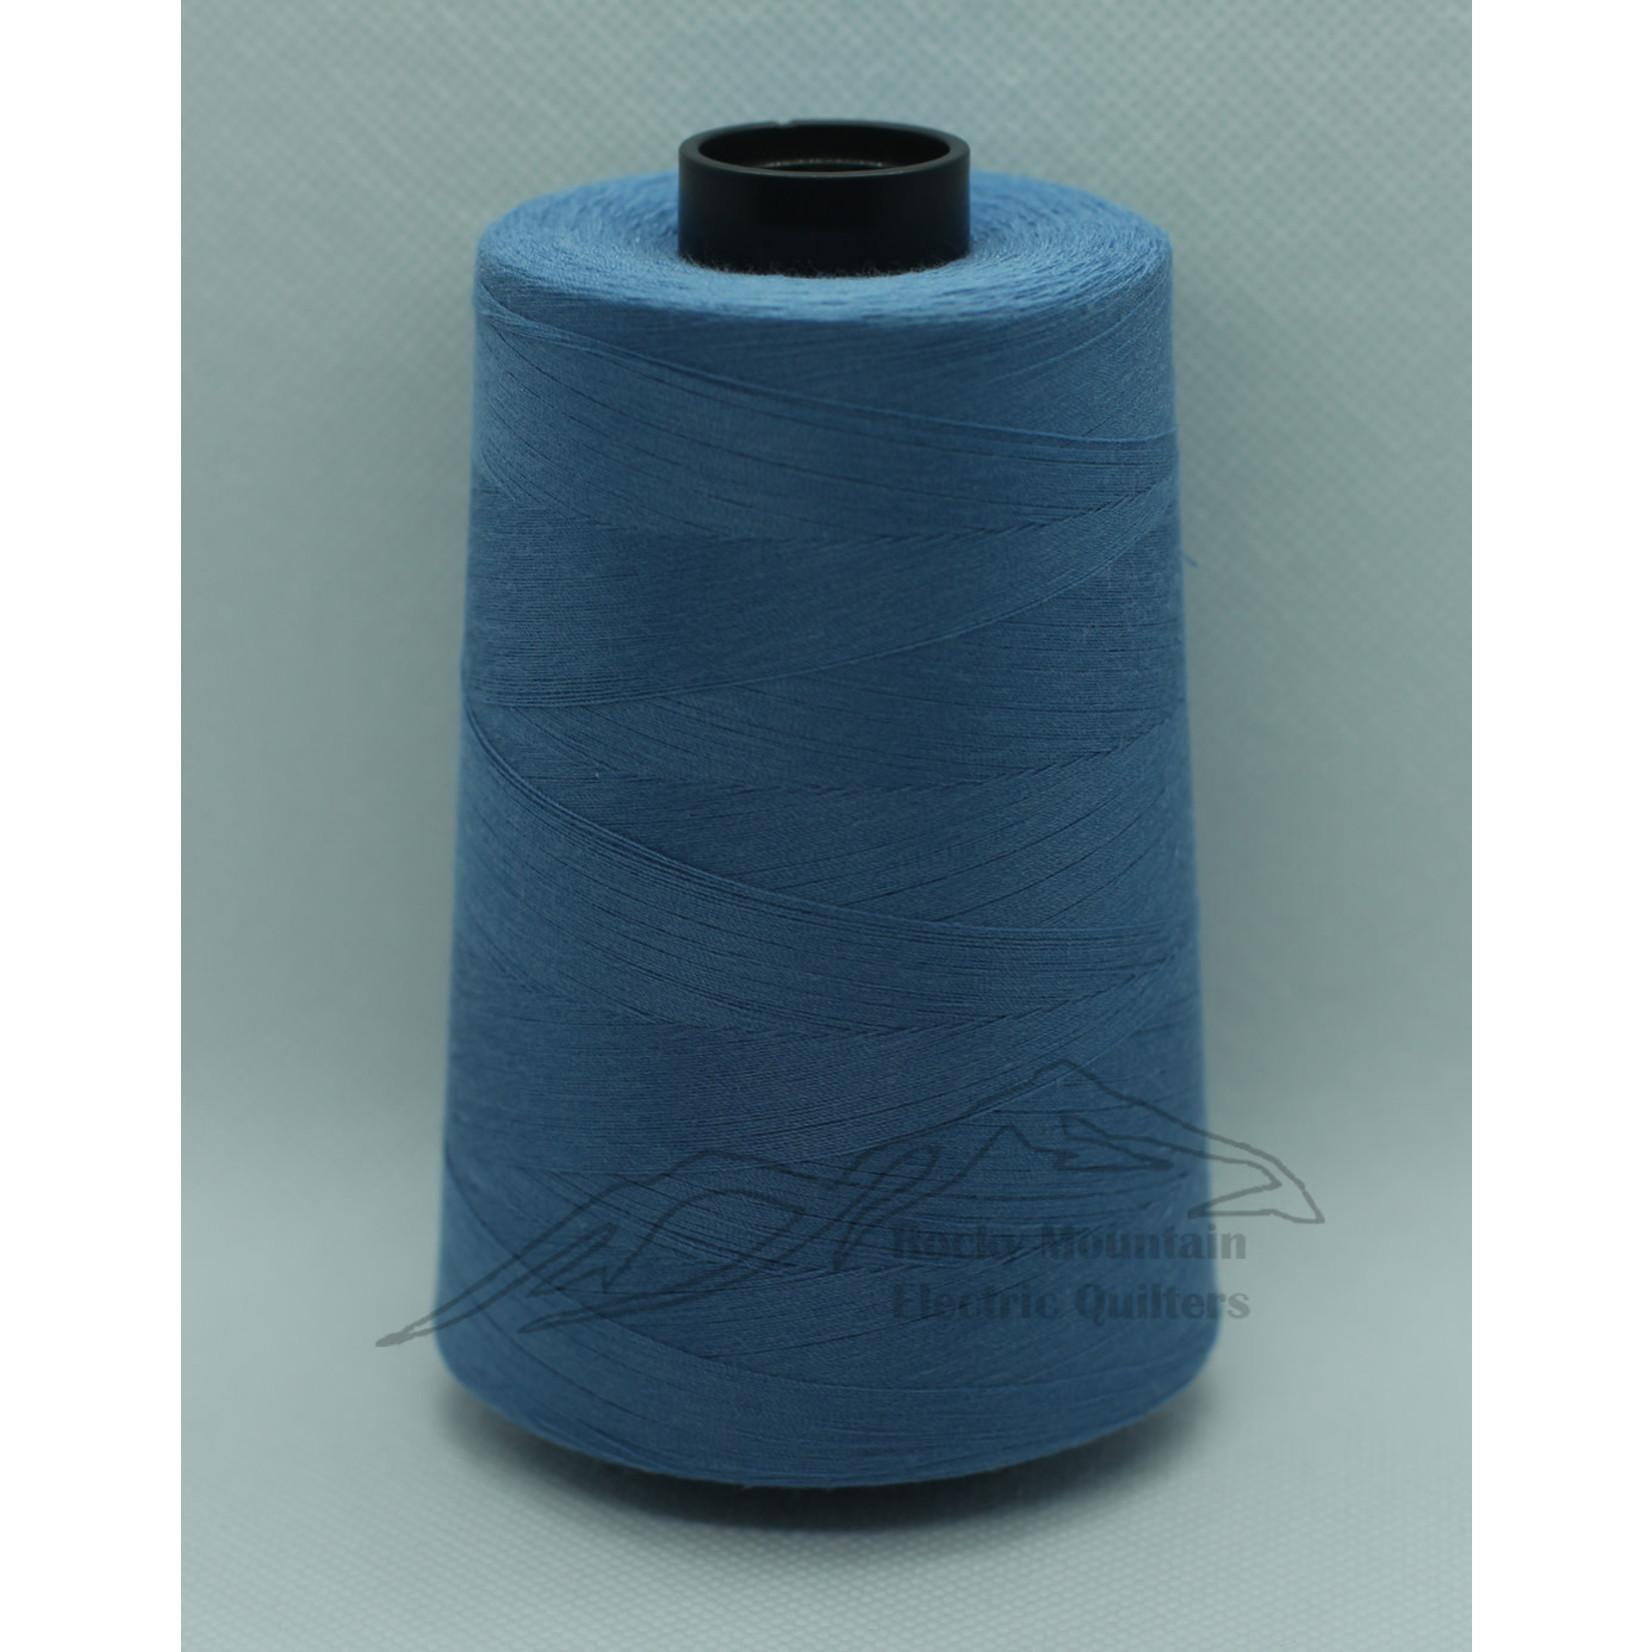 A & E 32089 Lucerne Blue, Permacore Tex 30